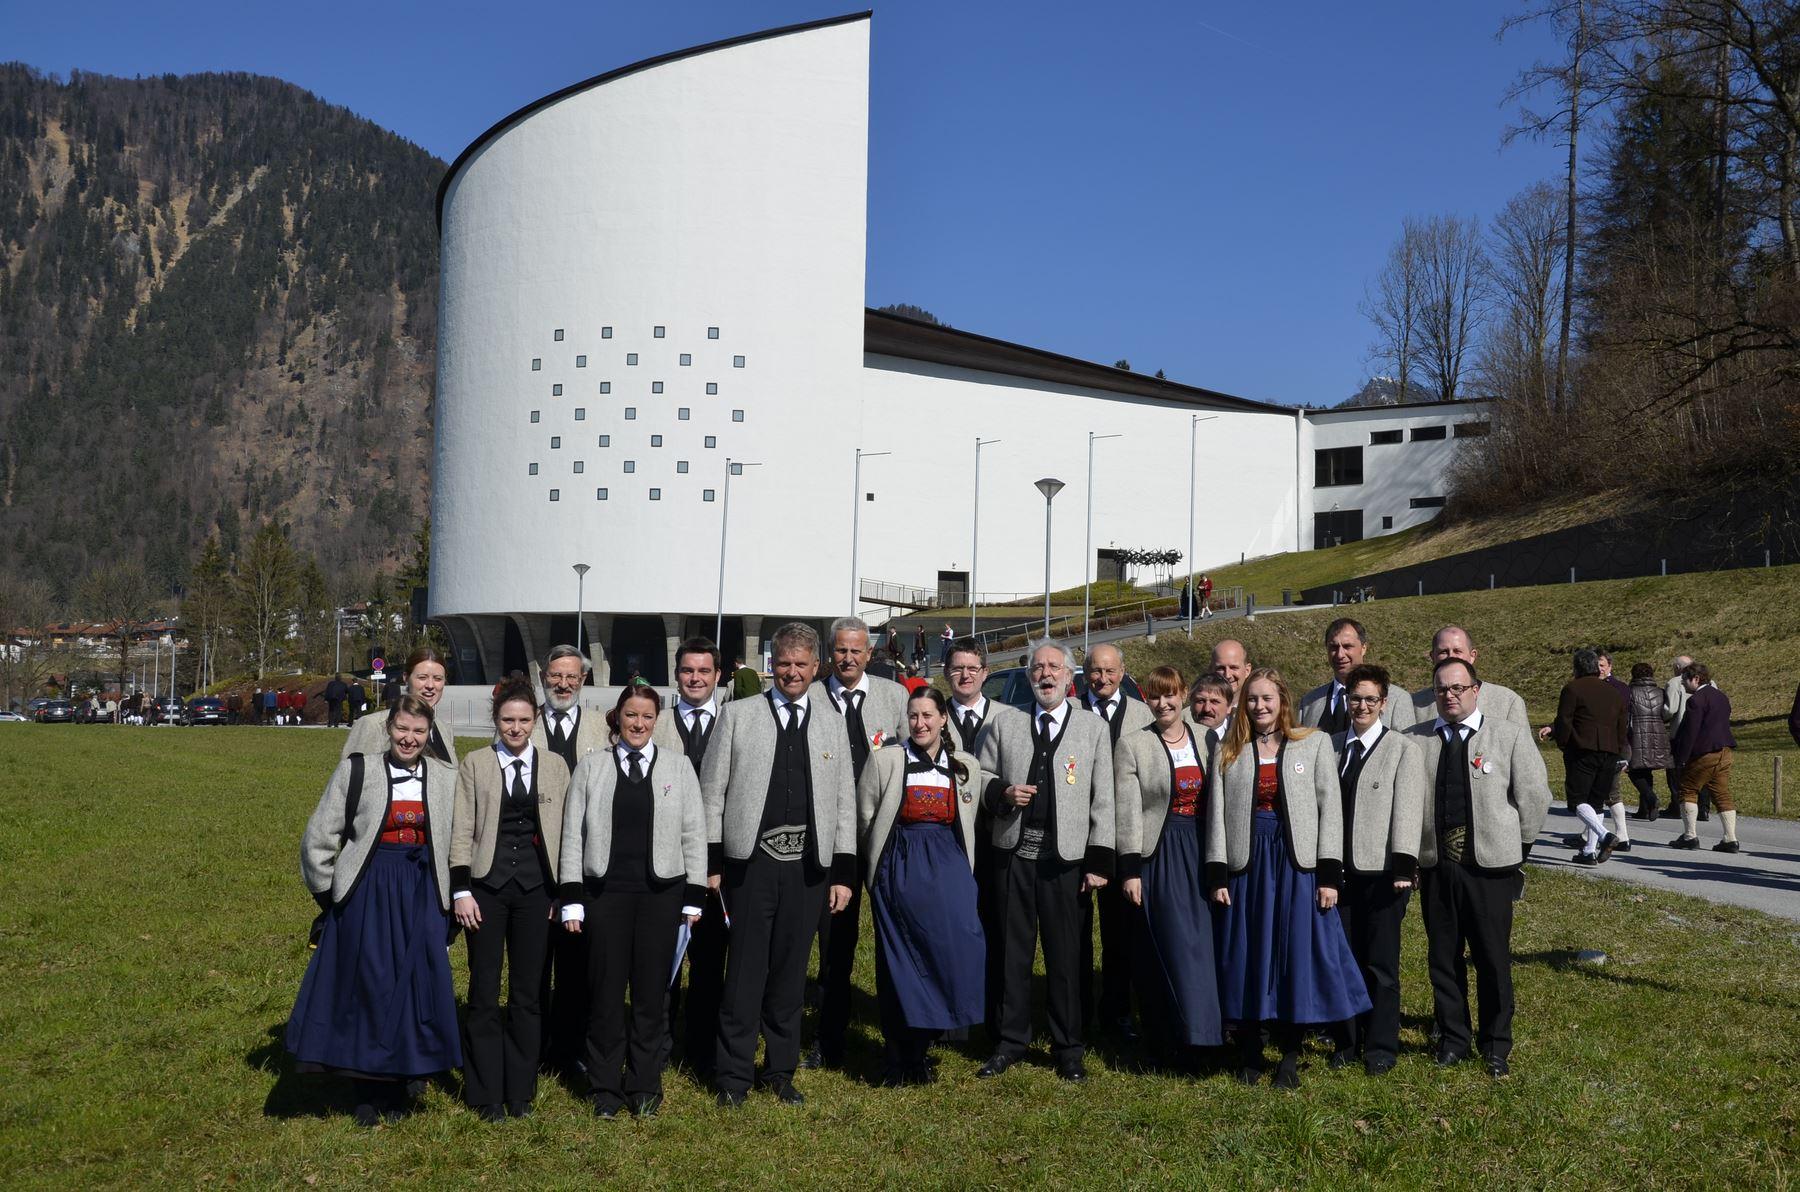 2017-03-12 Landesverbandsitzung Erl 022